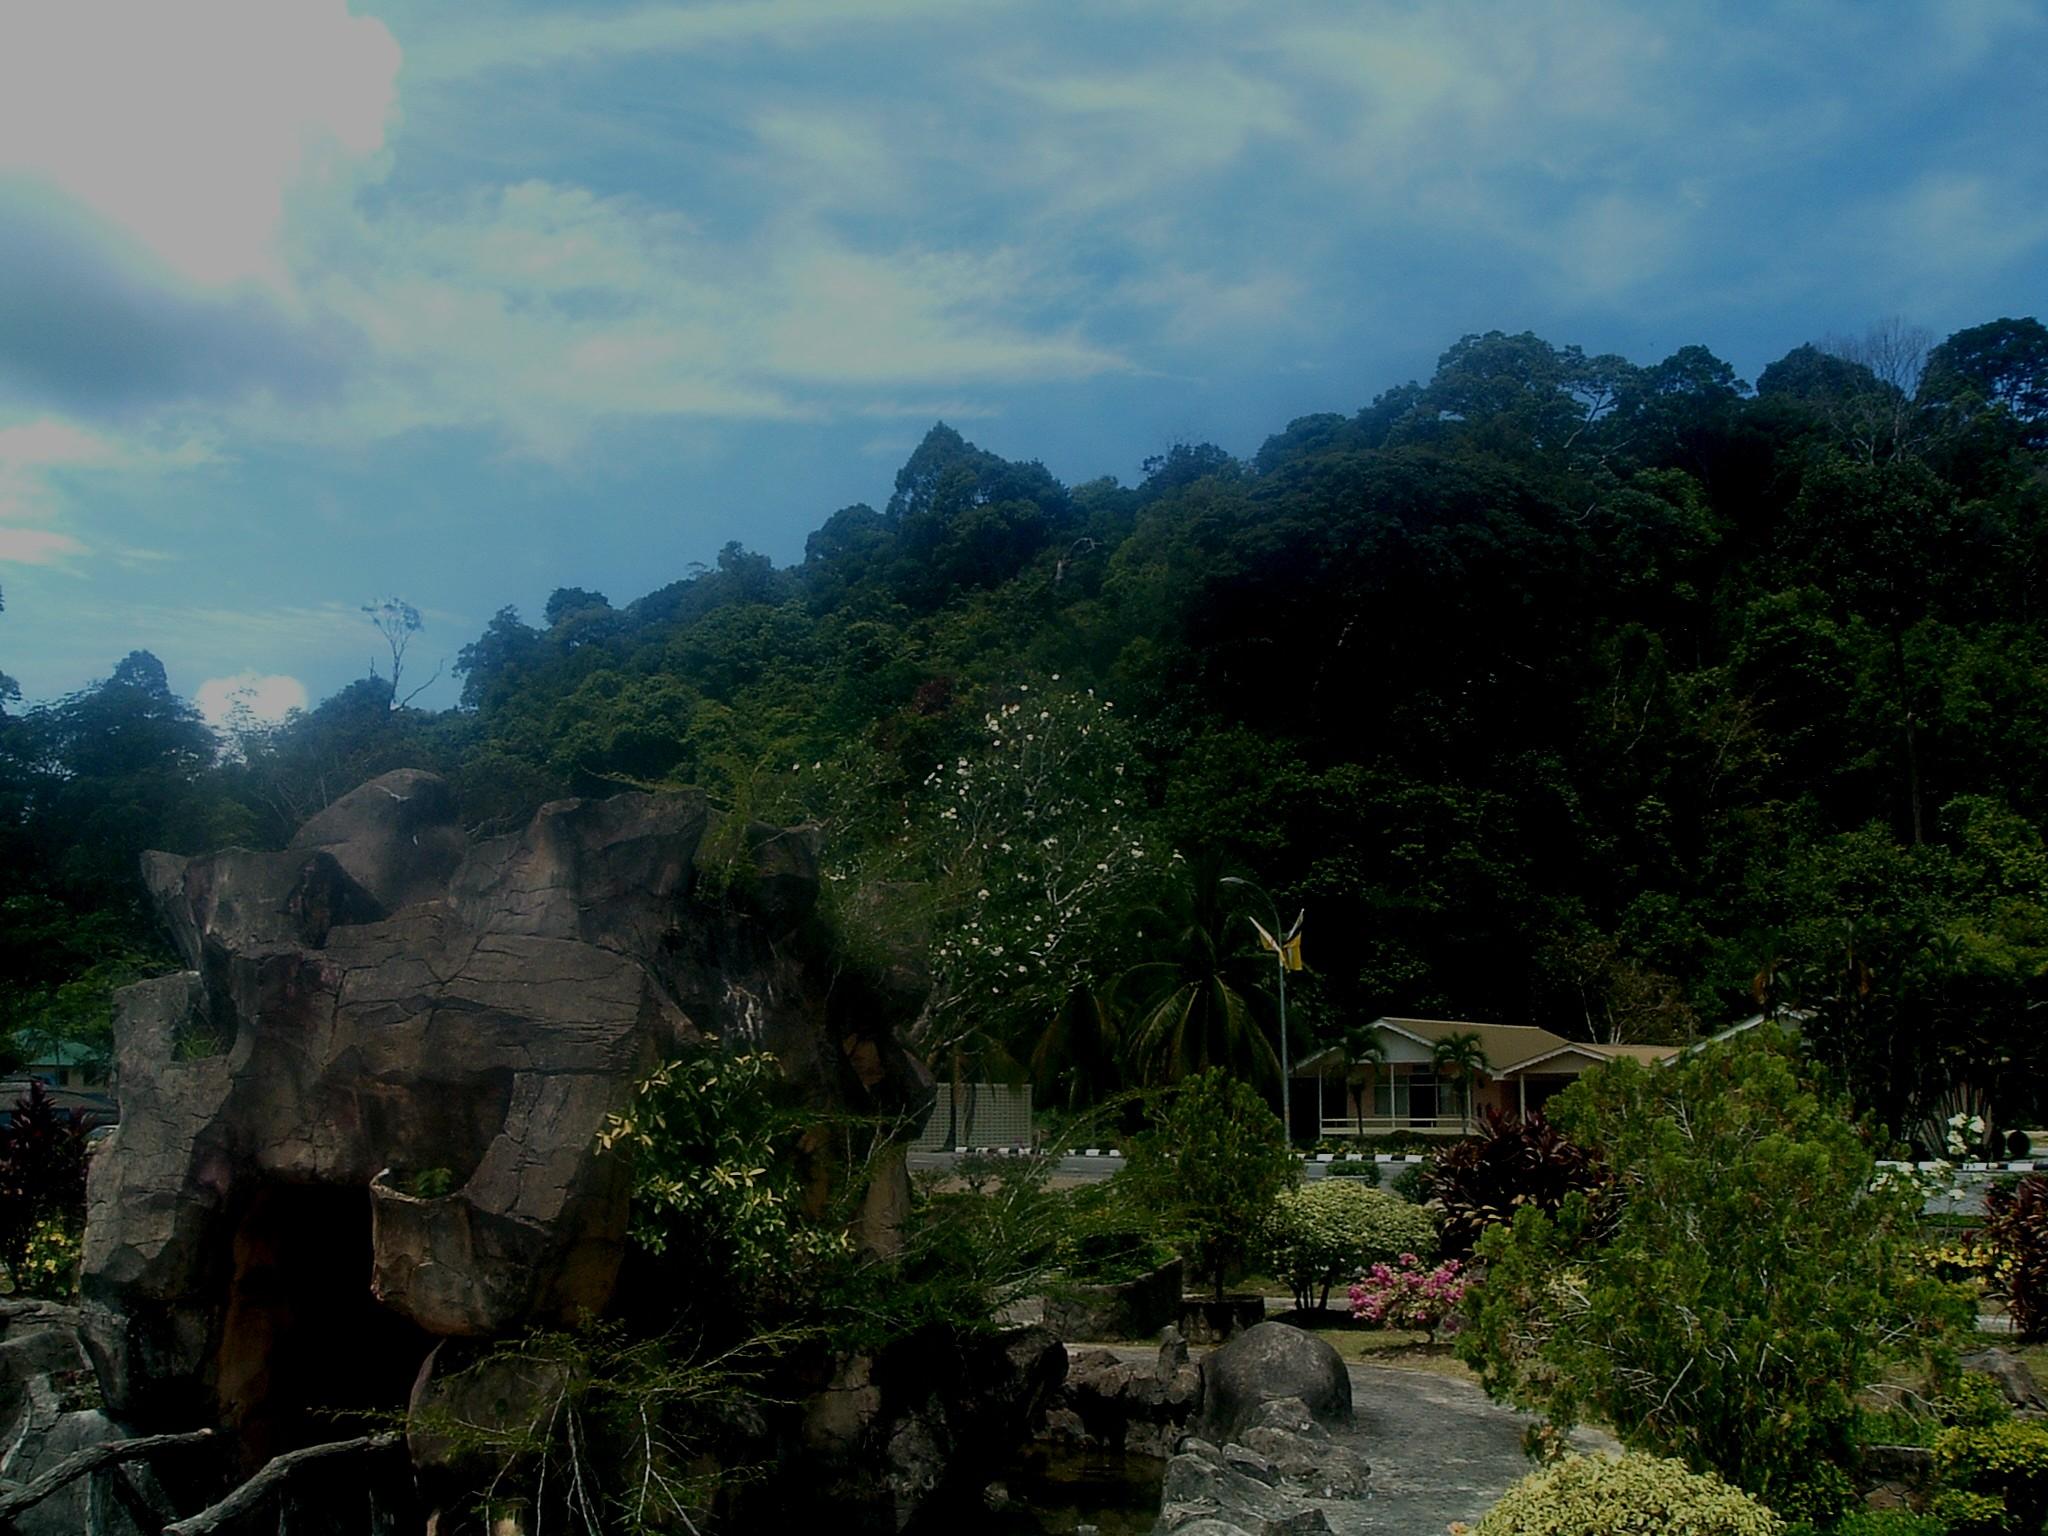 temburong district brunei.JPG